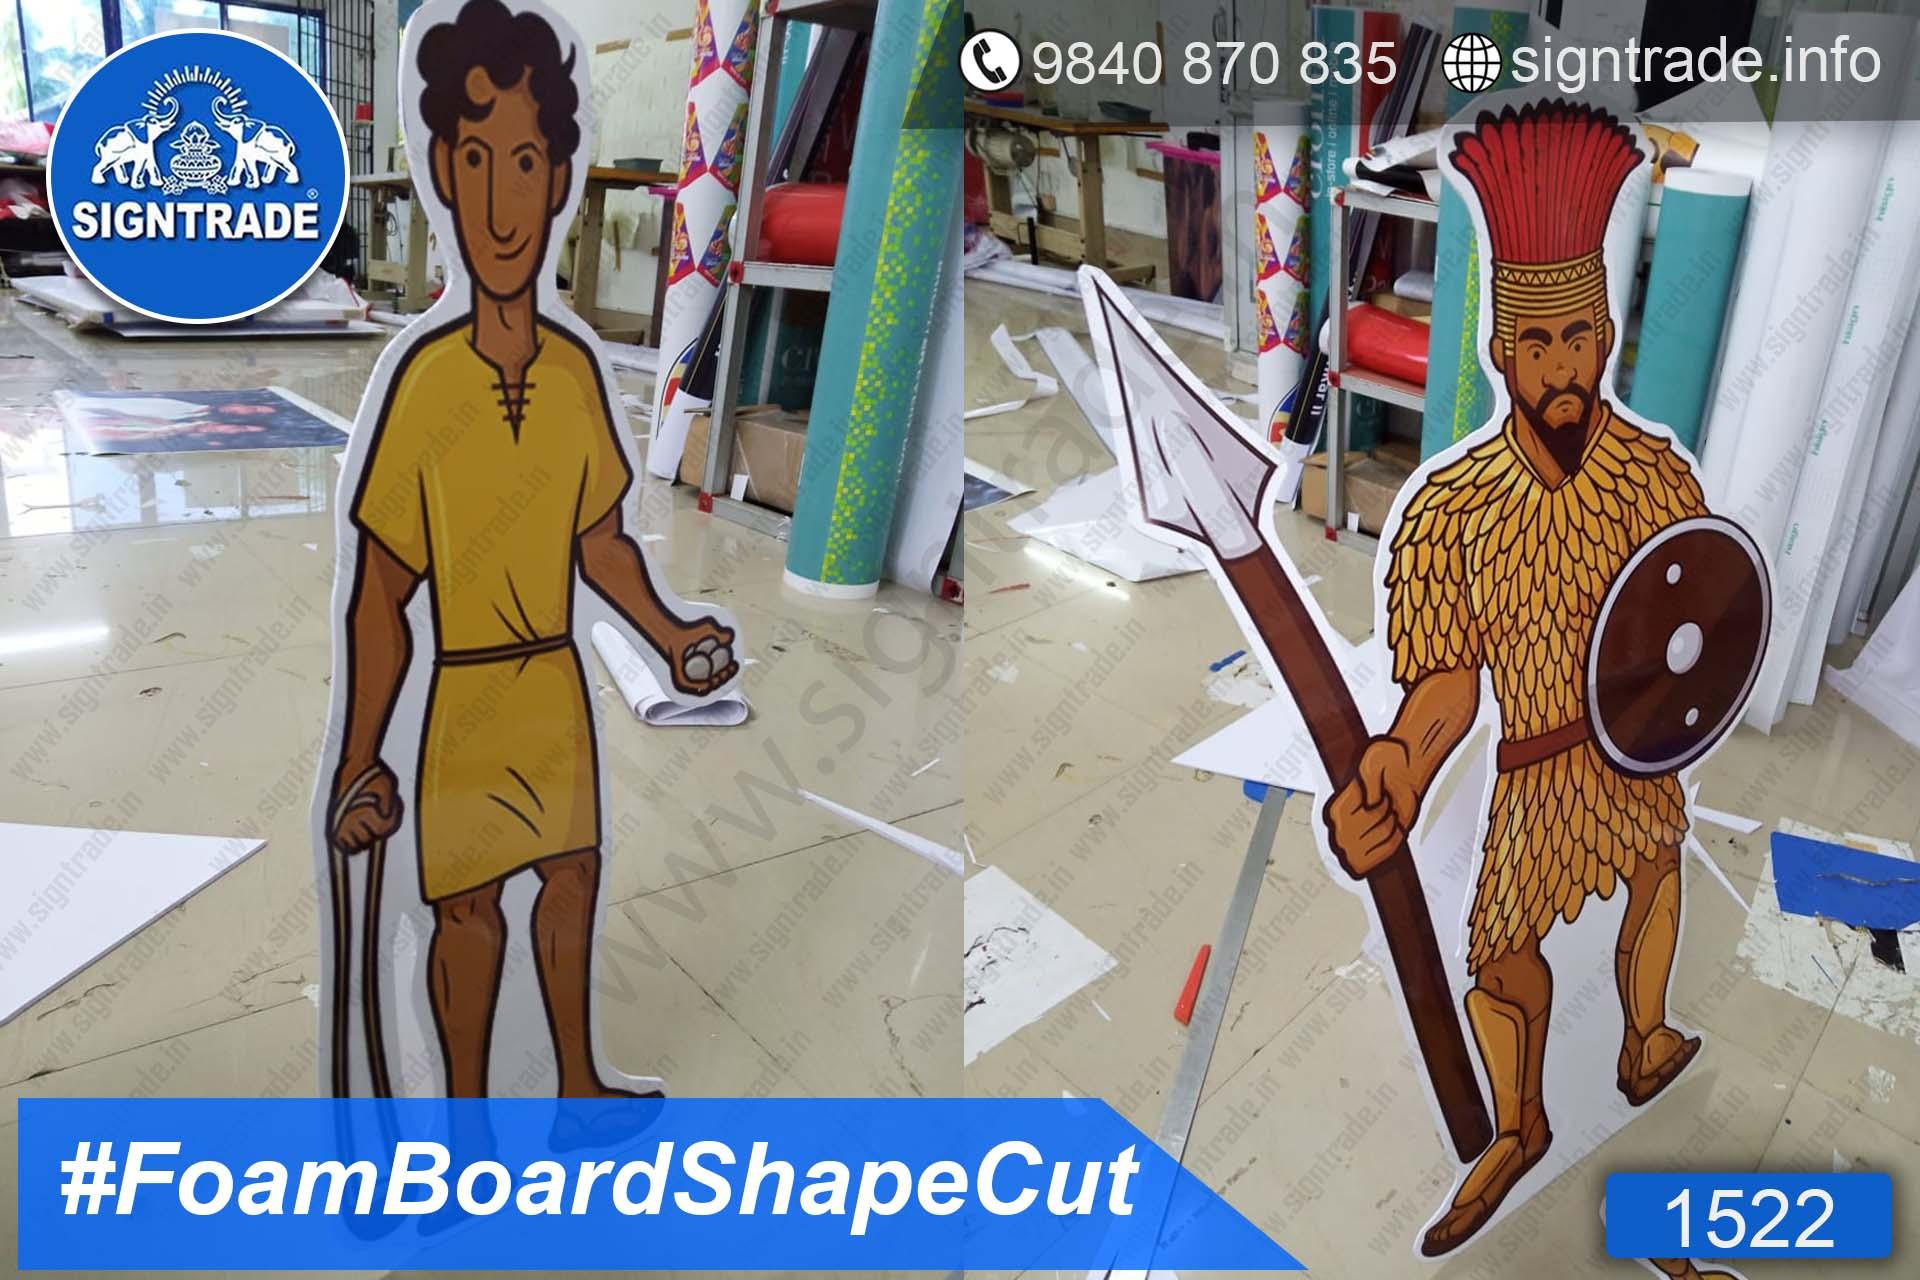 Cute Baby Foam Board CutOut Display - SIGNTRADE - Foam Board CutOut Board Manufacture in Chennai